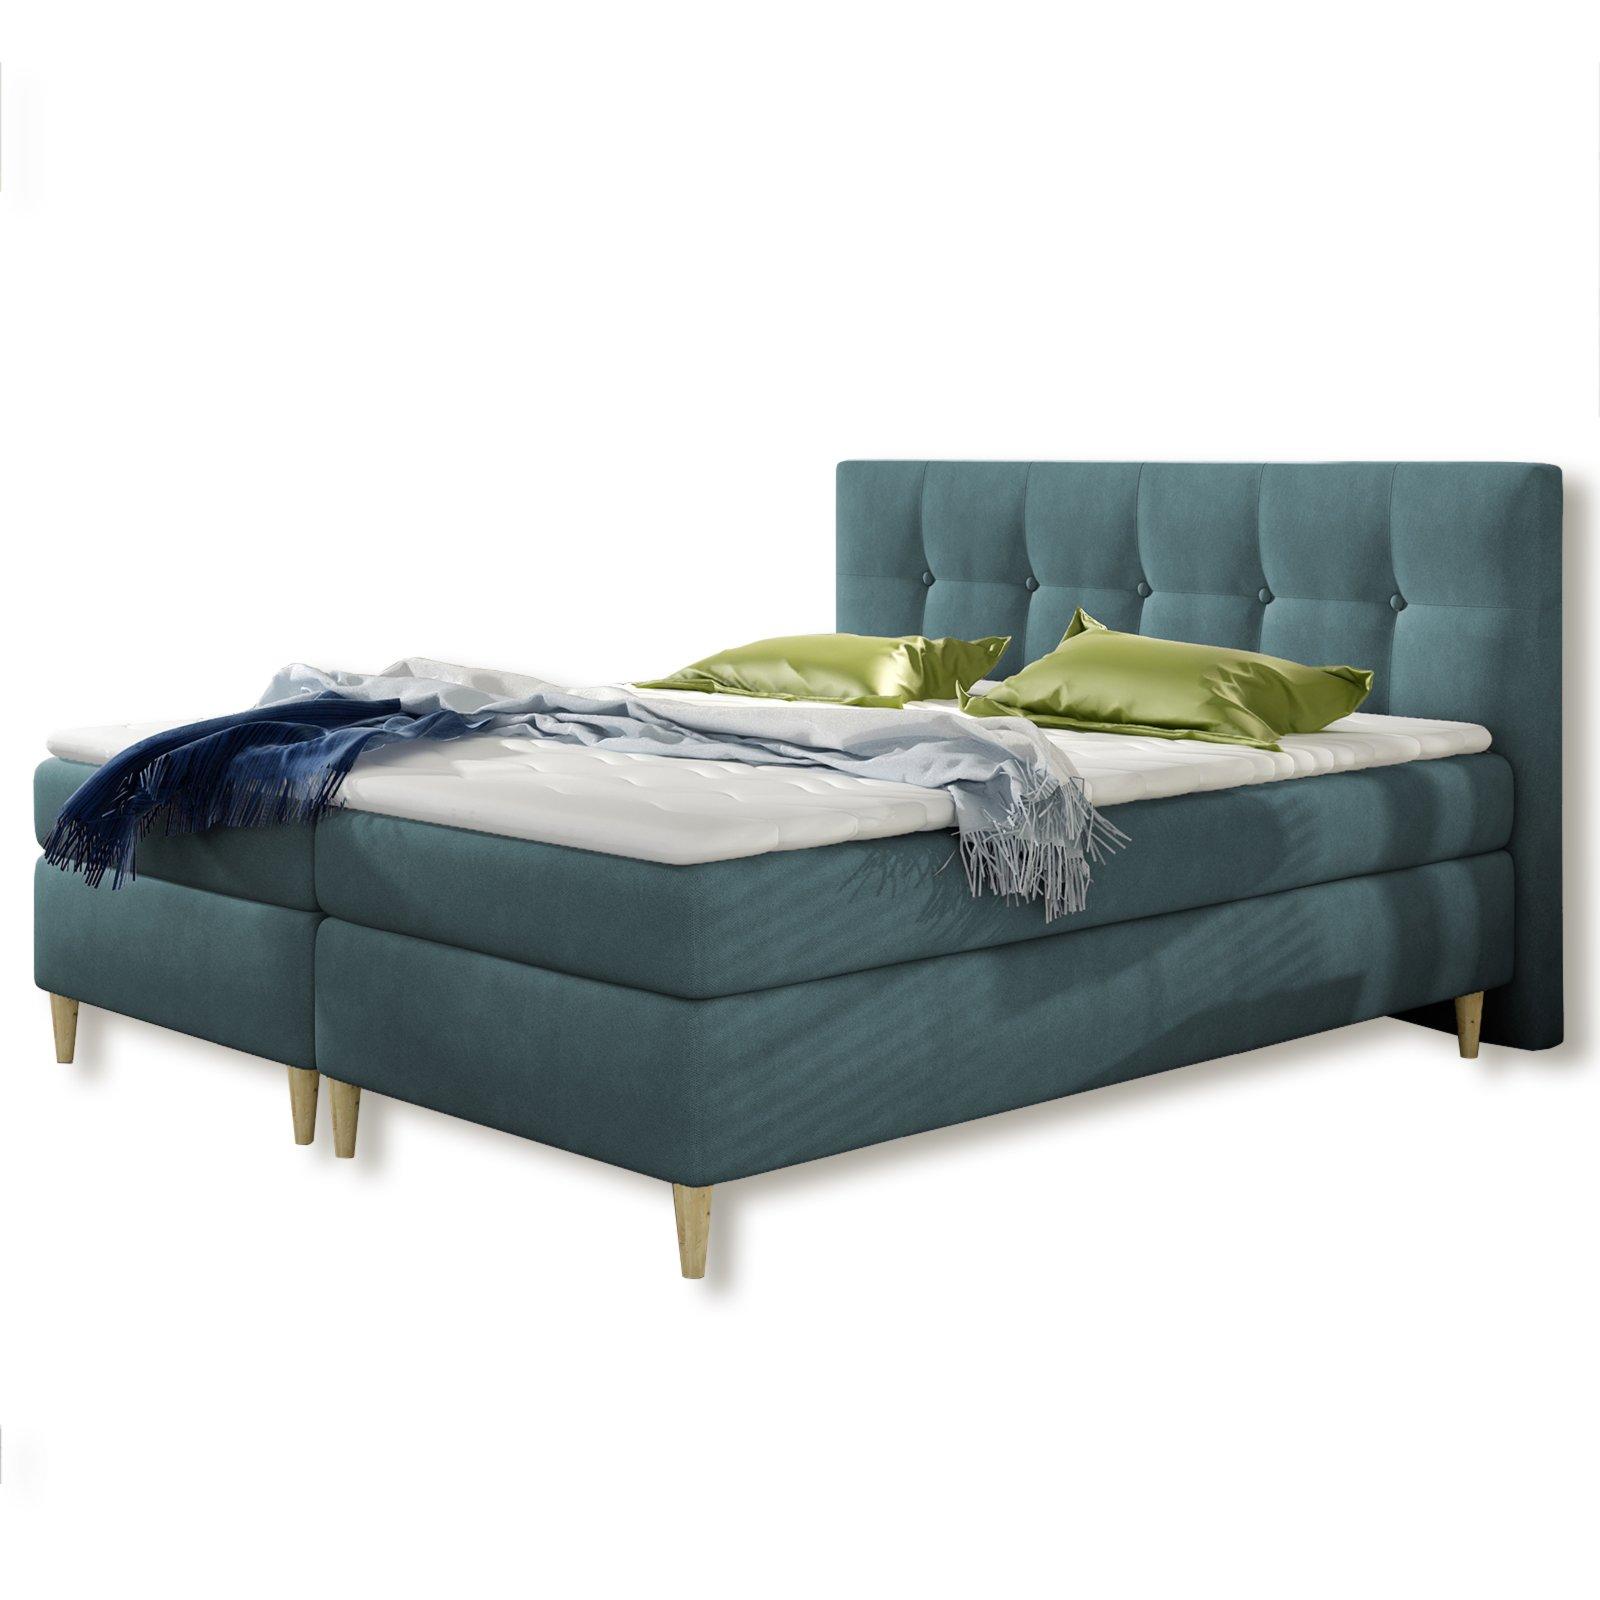 boxspringbett eden petrol h2 180x200 cm boxspringbetten betten m bel roller m belhaus. Black Bedroom Furniture Sets. Home Design Ideas